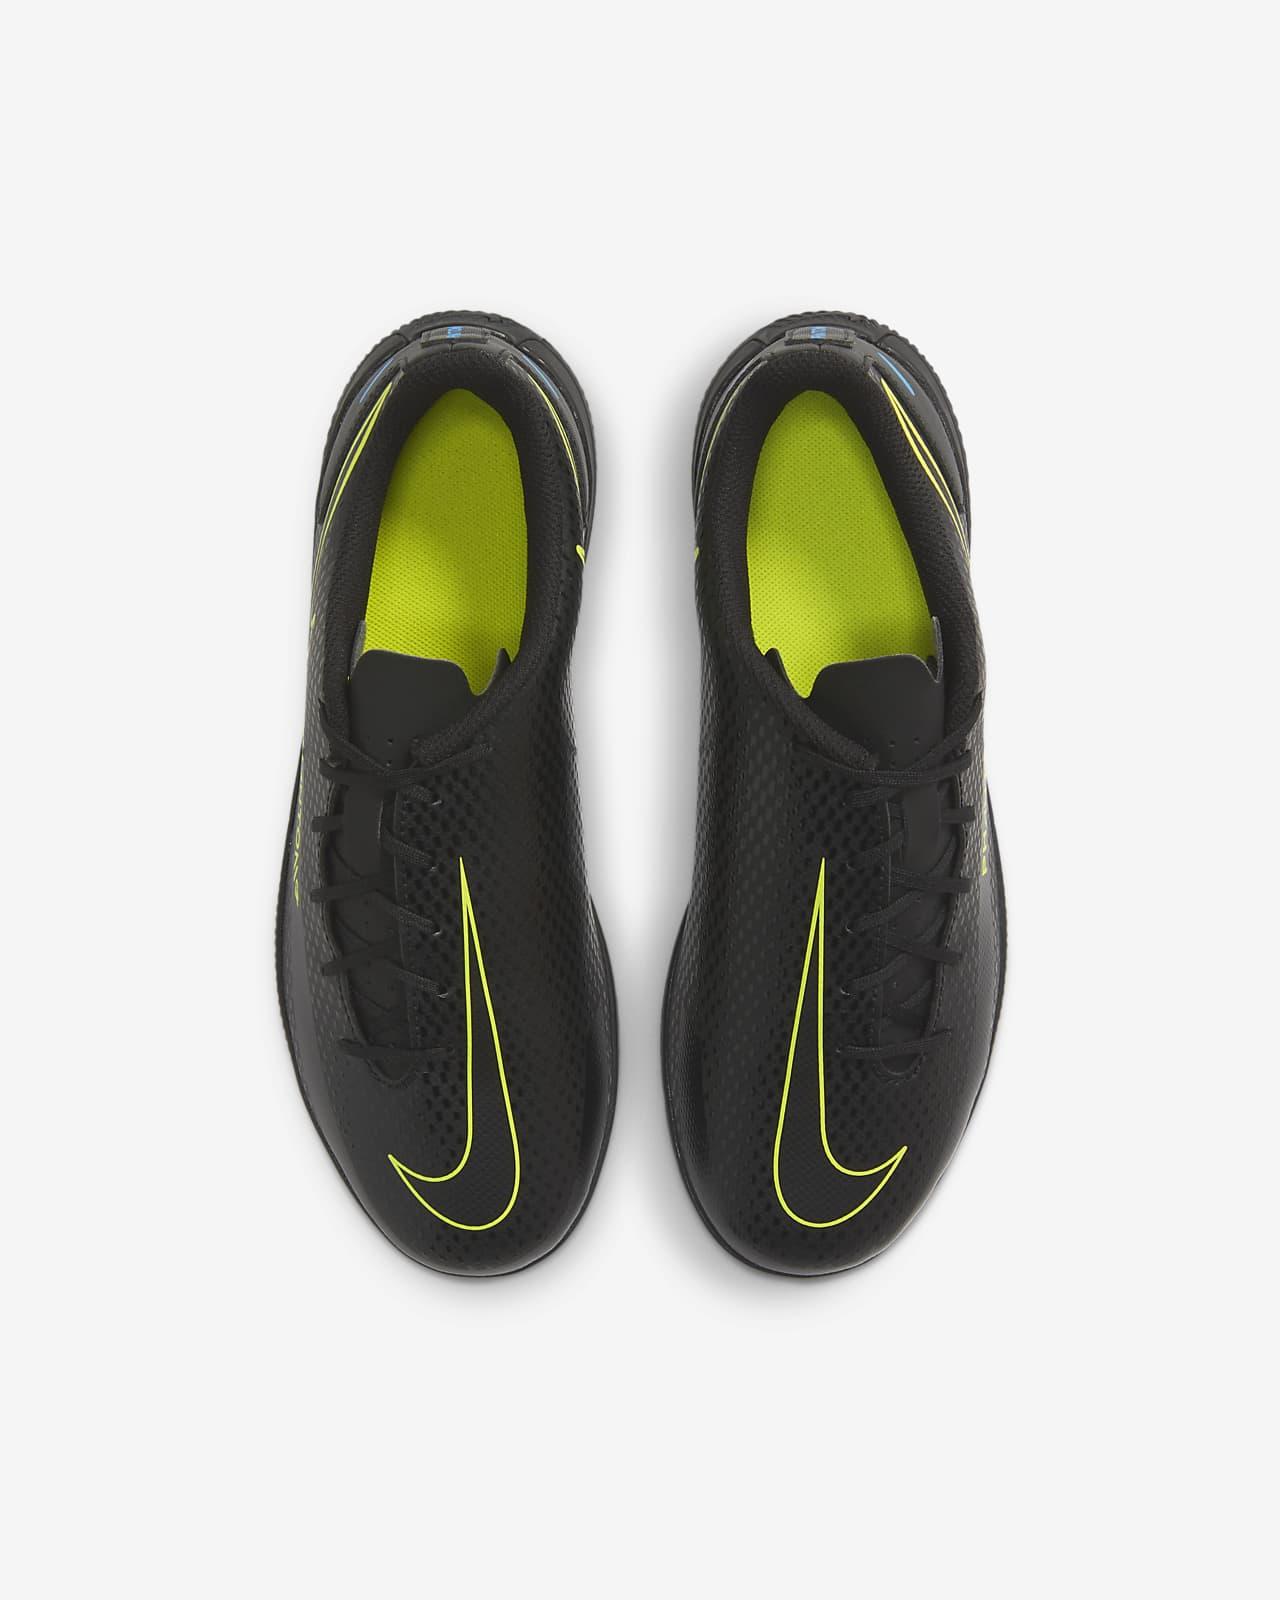 Chaussure de football en salle Nike Jr. Phantom GT Club IC pour ...